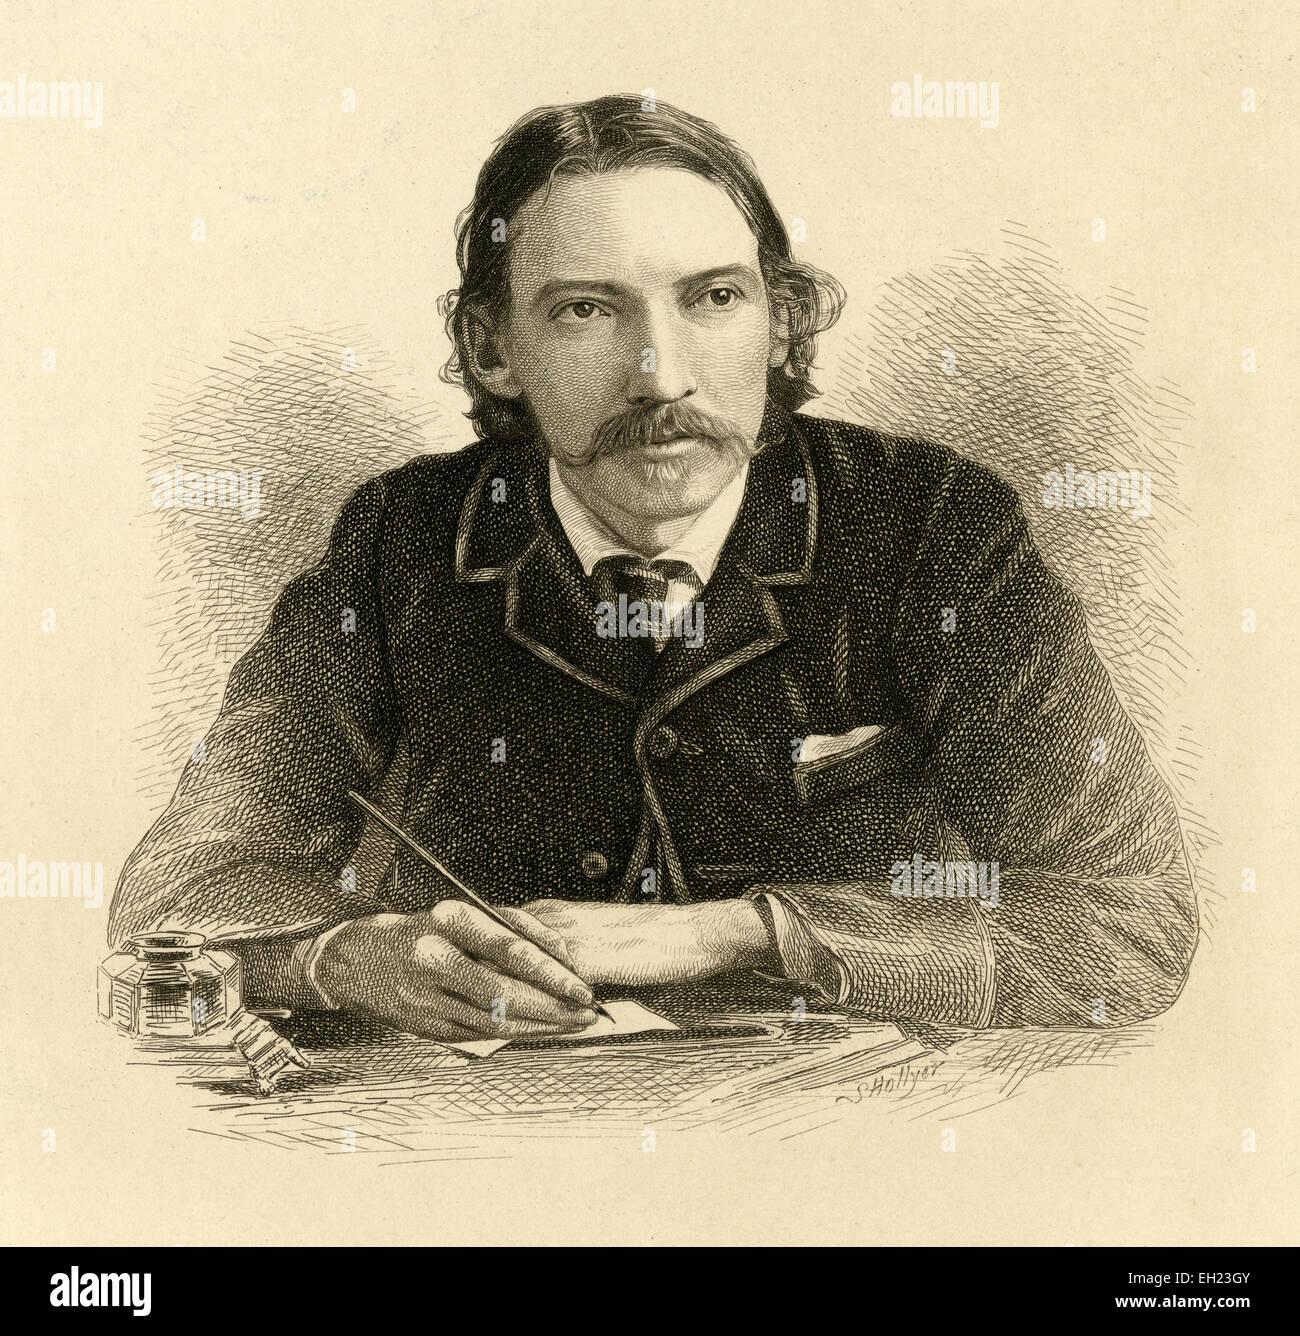 Antique circa 1910 engraving by Samuel Hollyer of Robert Louis Stevenson. Robert Louis Balfour Stevenson (13 November - Stock Image